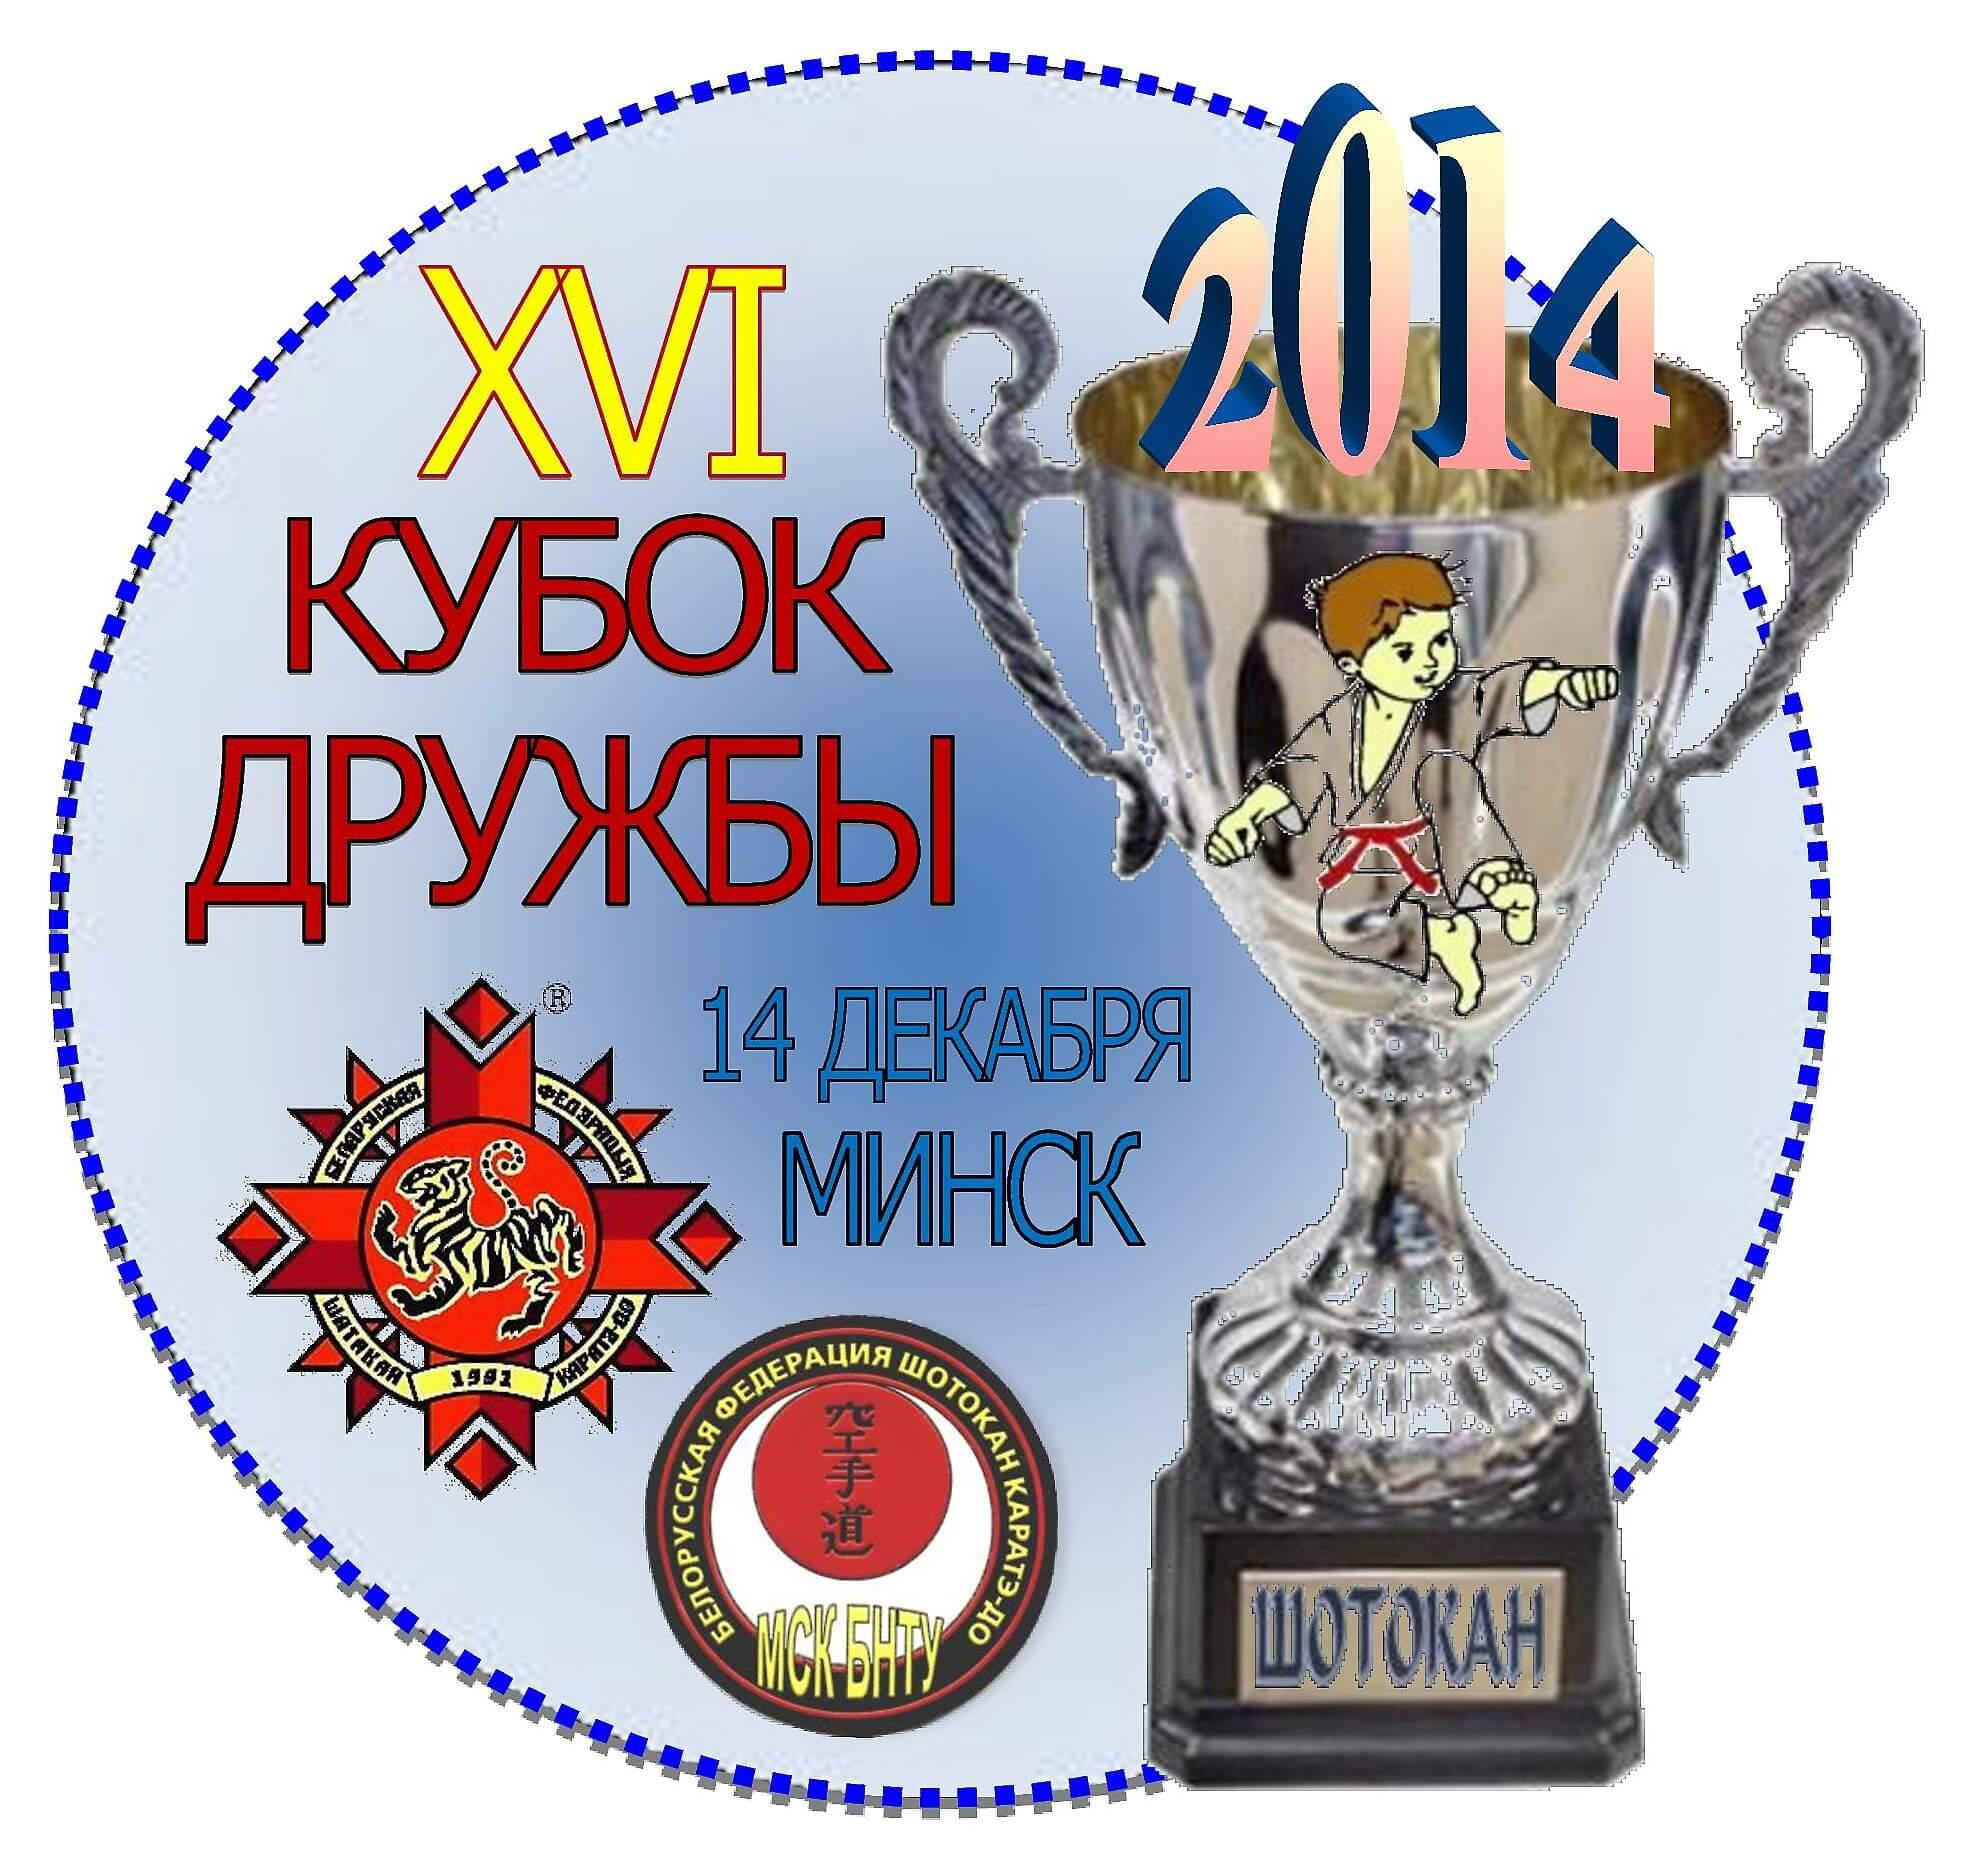 2014 Кубок Дружбы эмблема ok